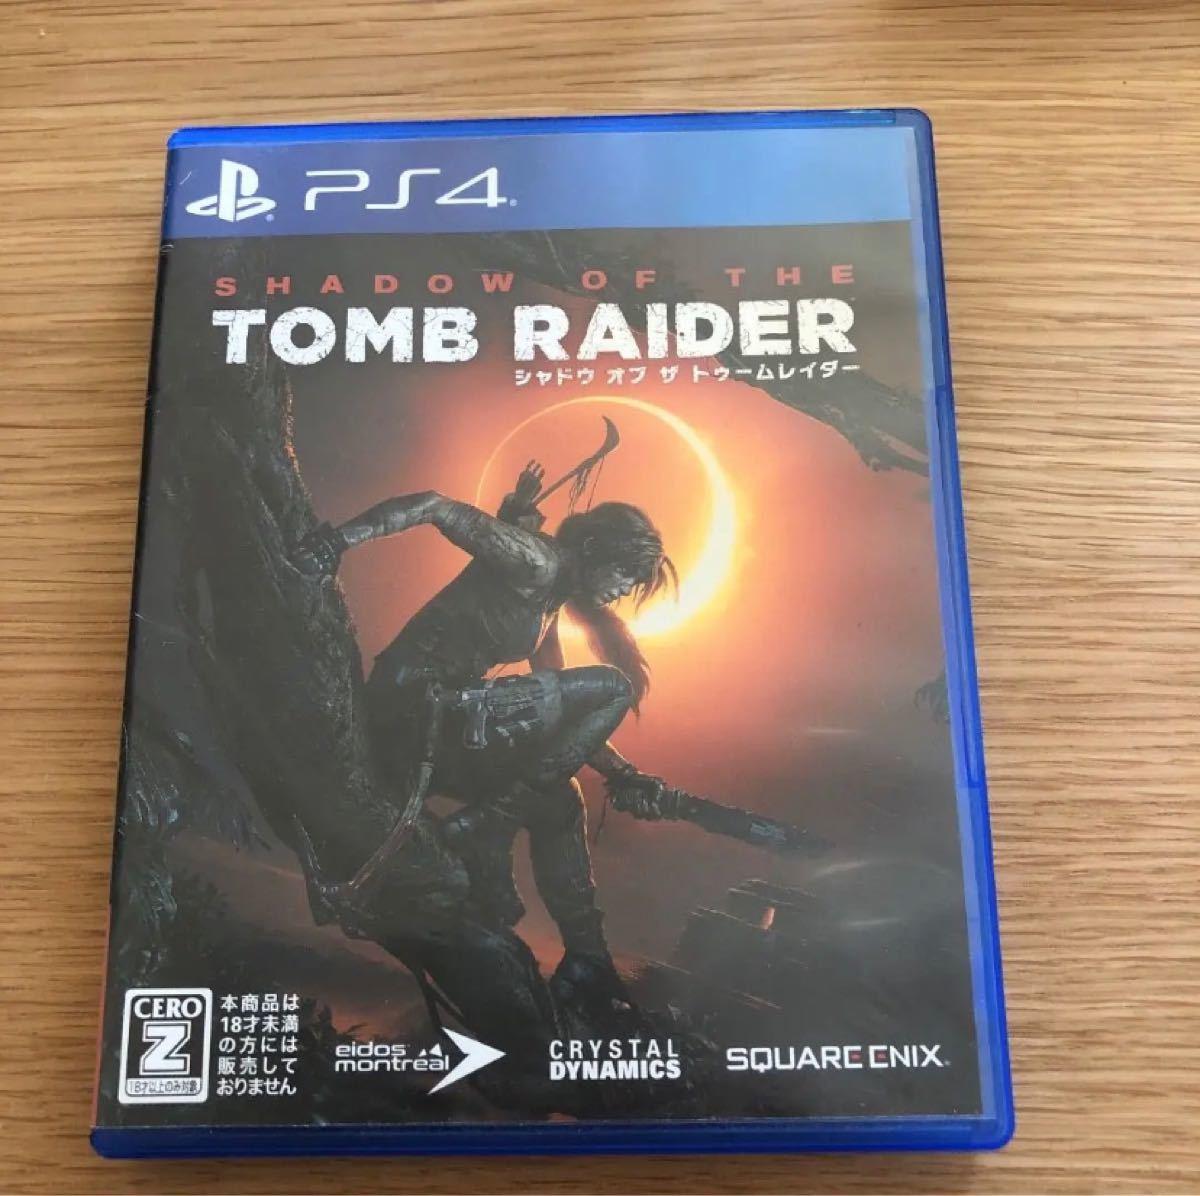 PS4 シャドウ・オブ・ザ・トゥームレイダー シャドウ オブ ザトゥームレイダー